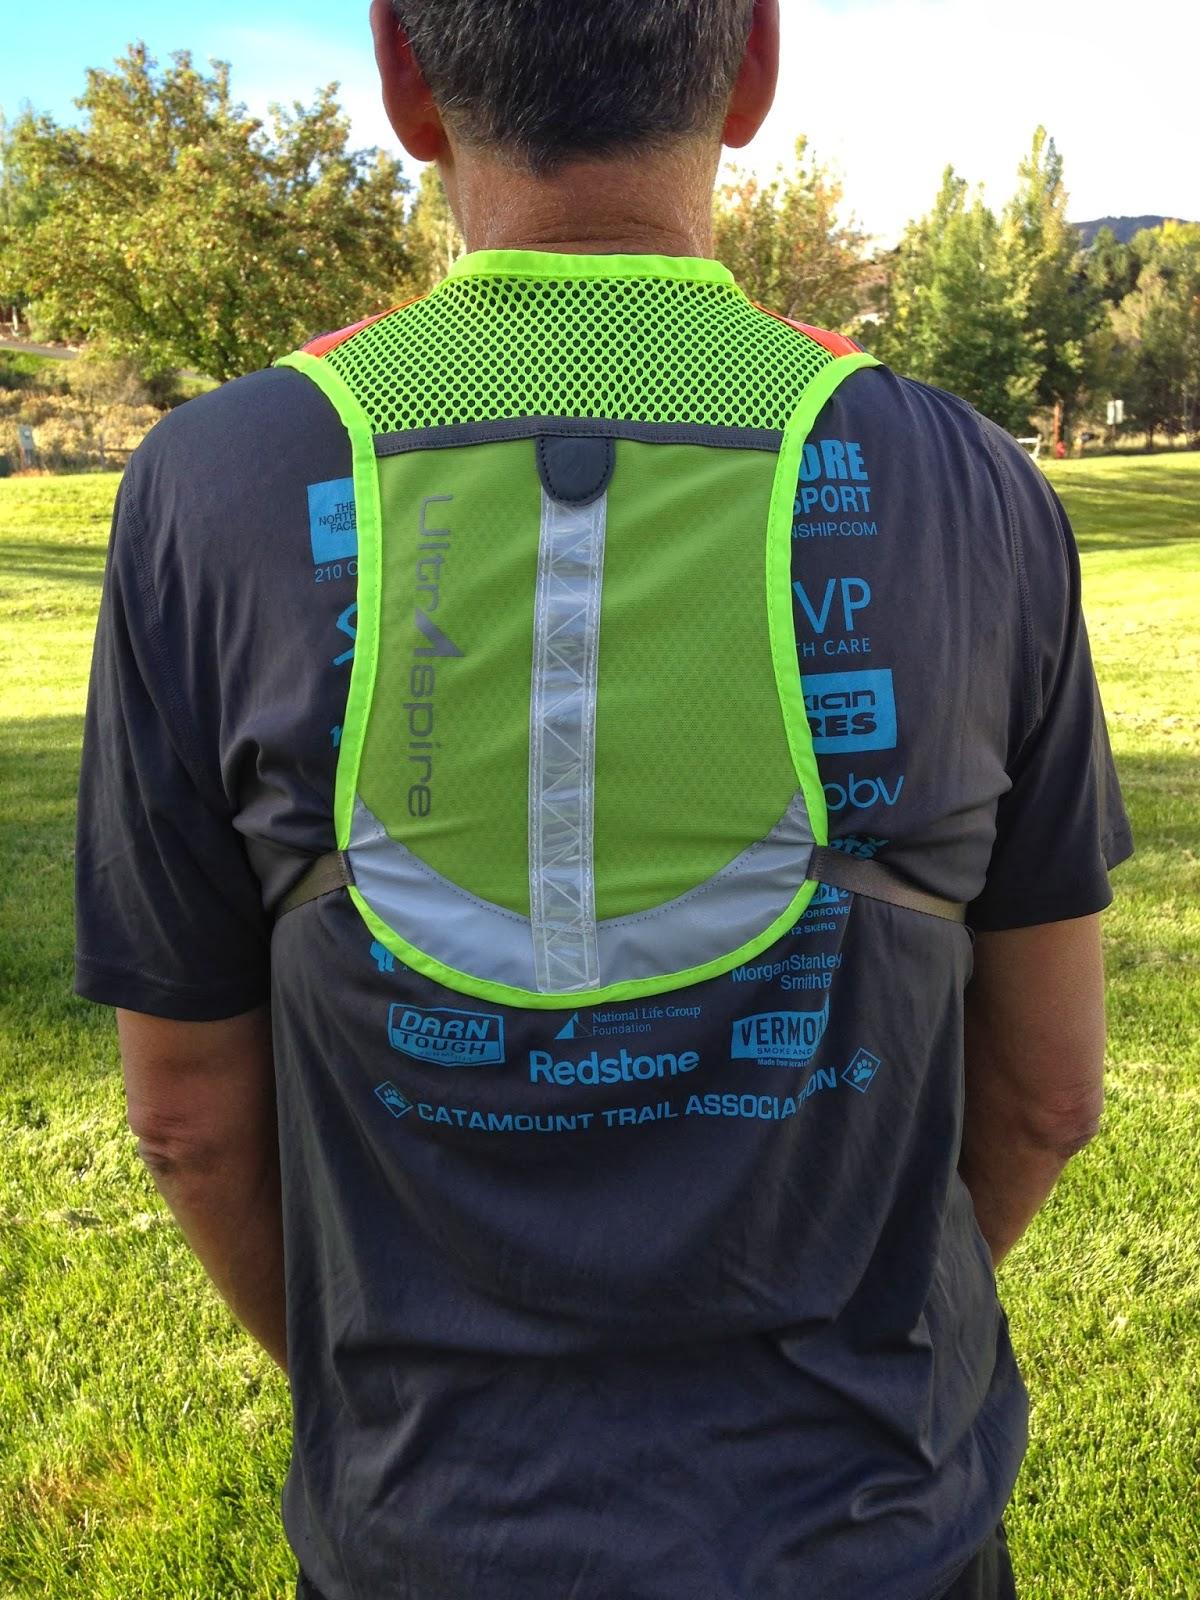 feb8218ce4 UltraSpire UltraViz Run Vest- rear magnetic closure pocket, fits 1 liter  hydration bladder